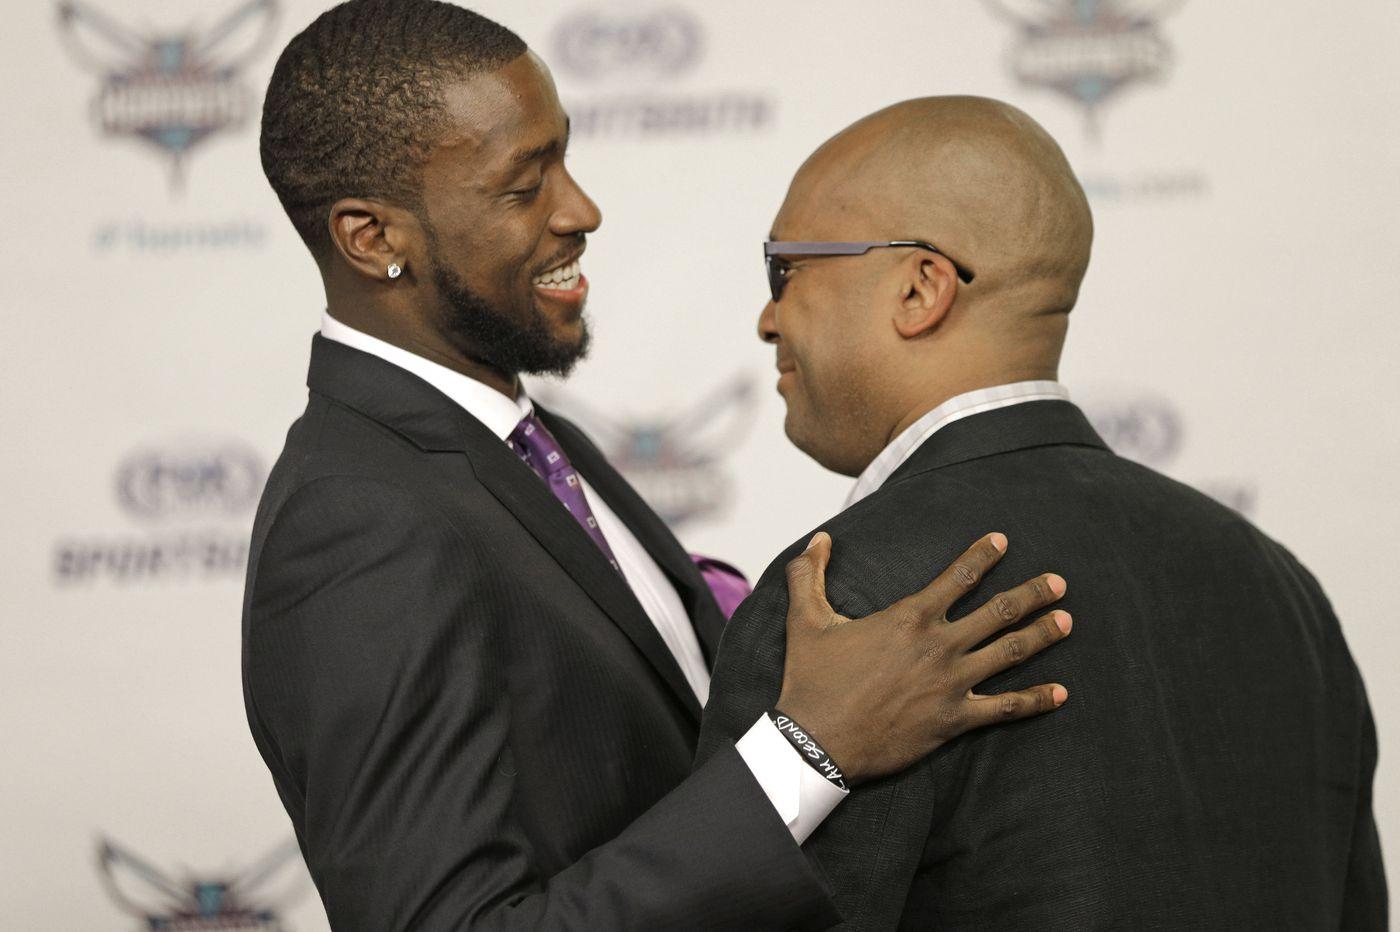 Pennsauken graduate William Wesley hired by New York Knicks